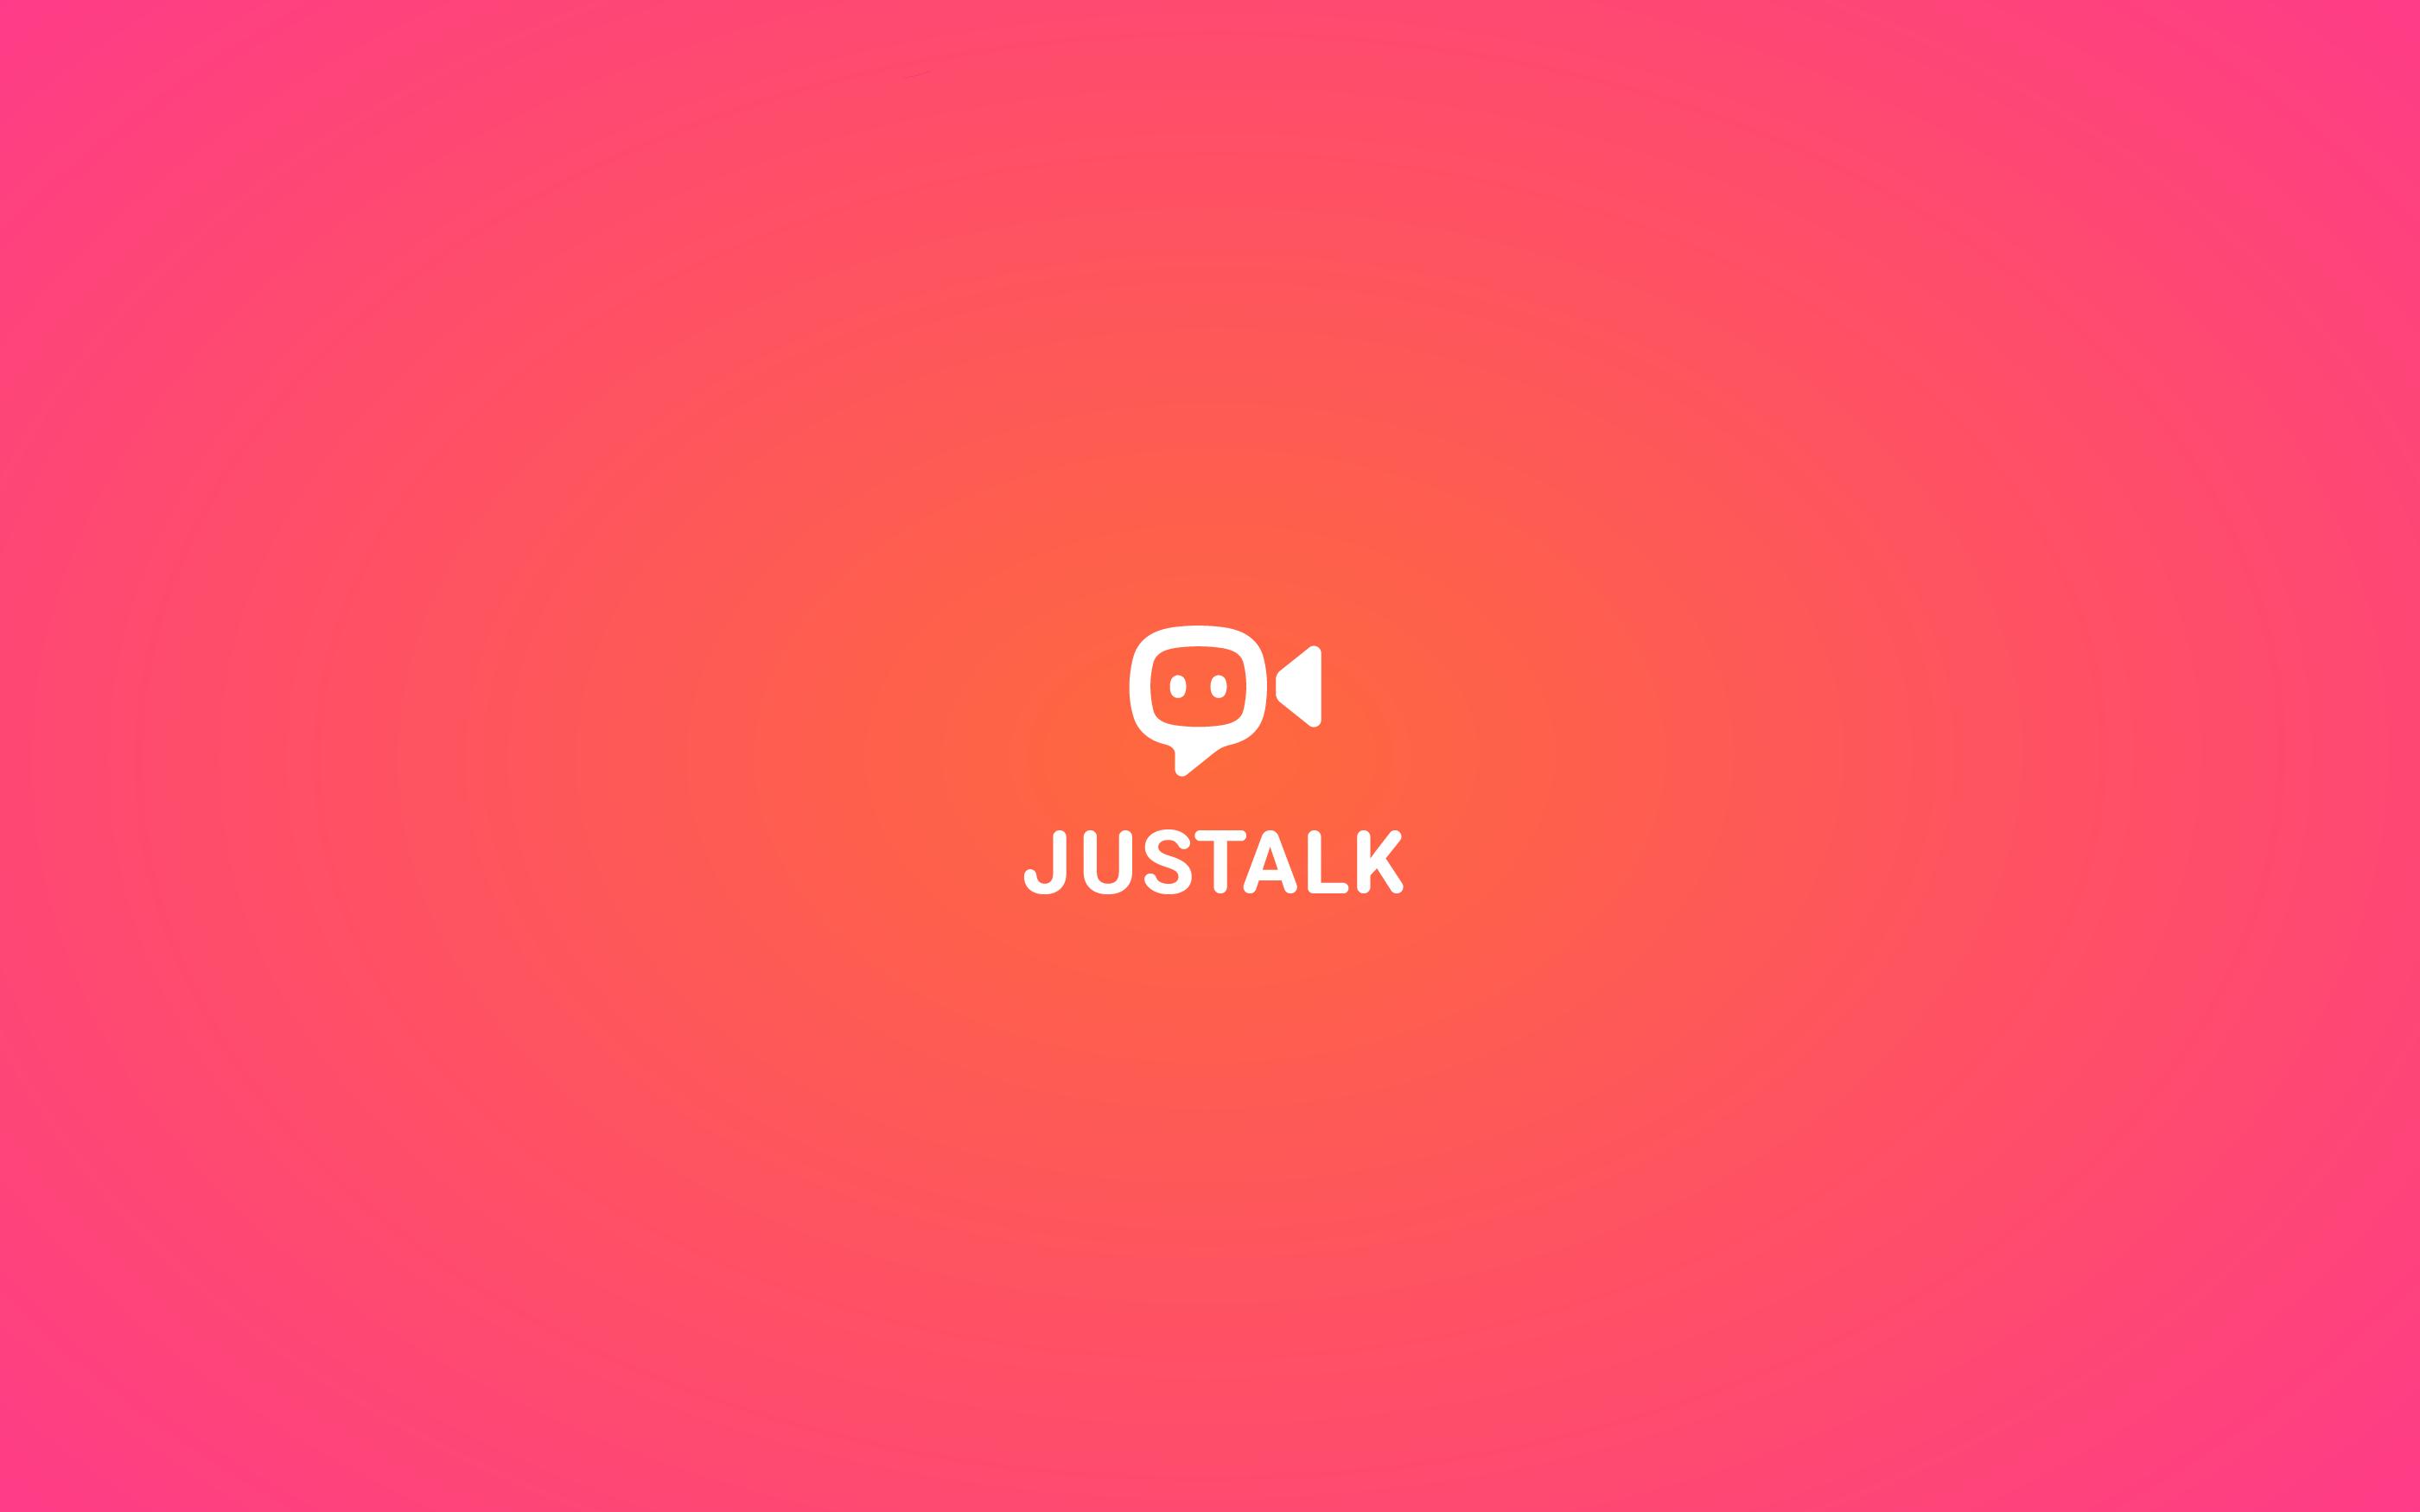 JusTalk Brand Identity on Behance